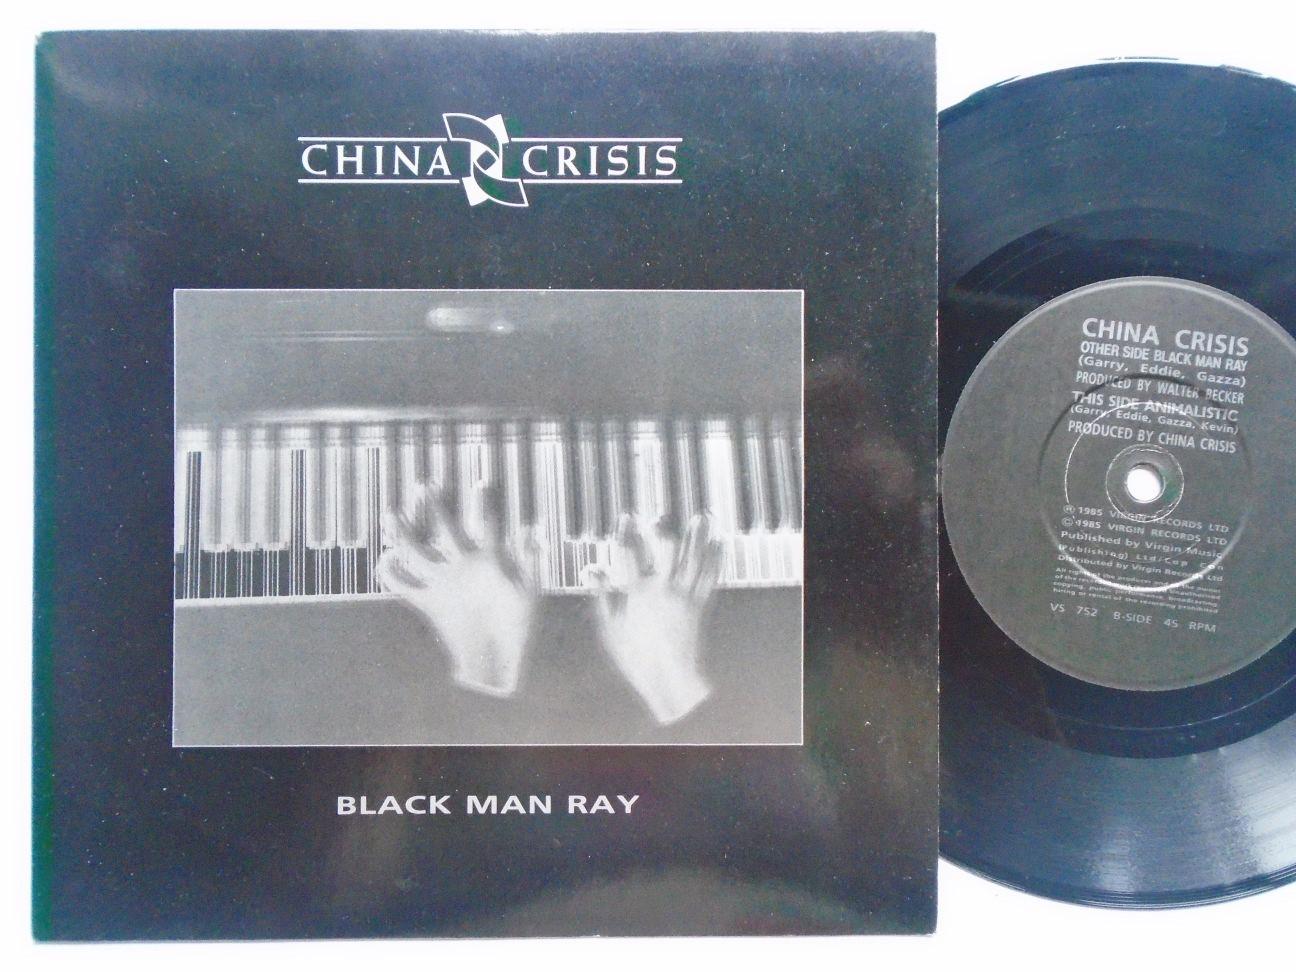 Black Man Ray/animalistic - China Crisis